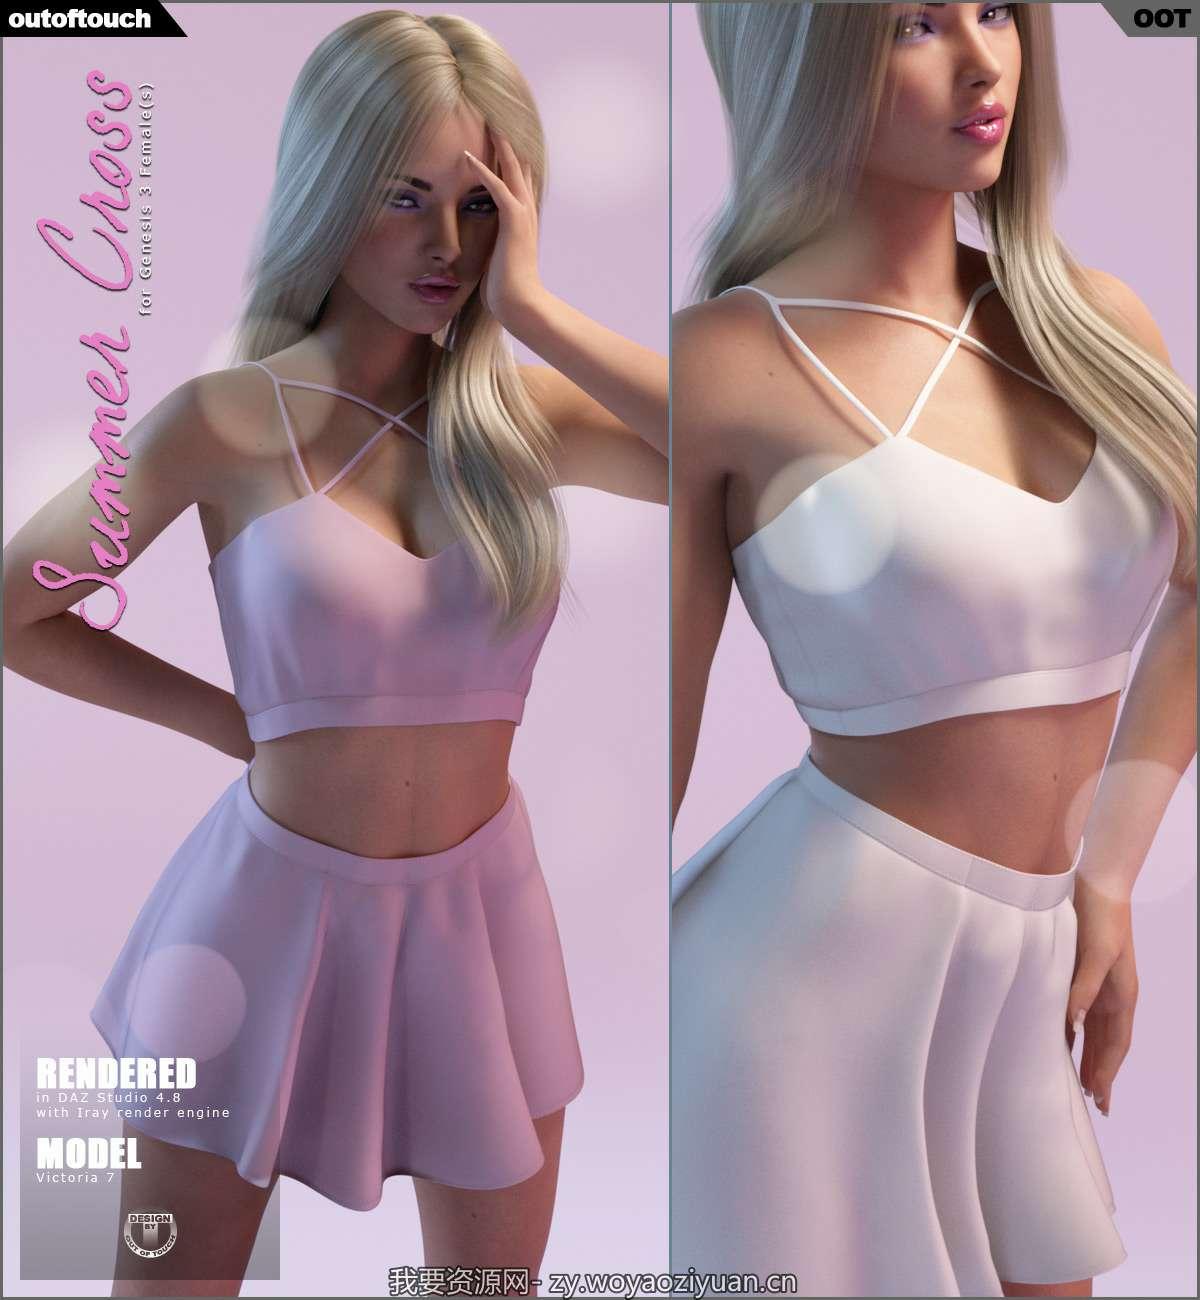 Summer Cross Fashion for Genesis 3 Female(s)